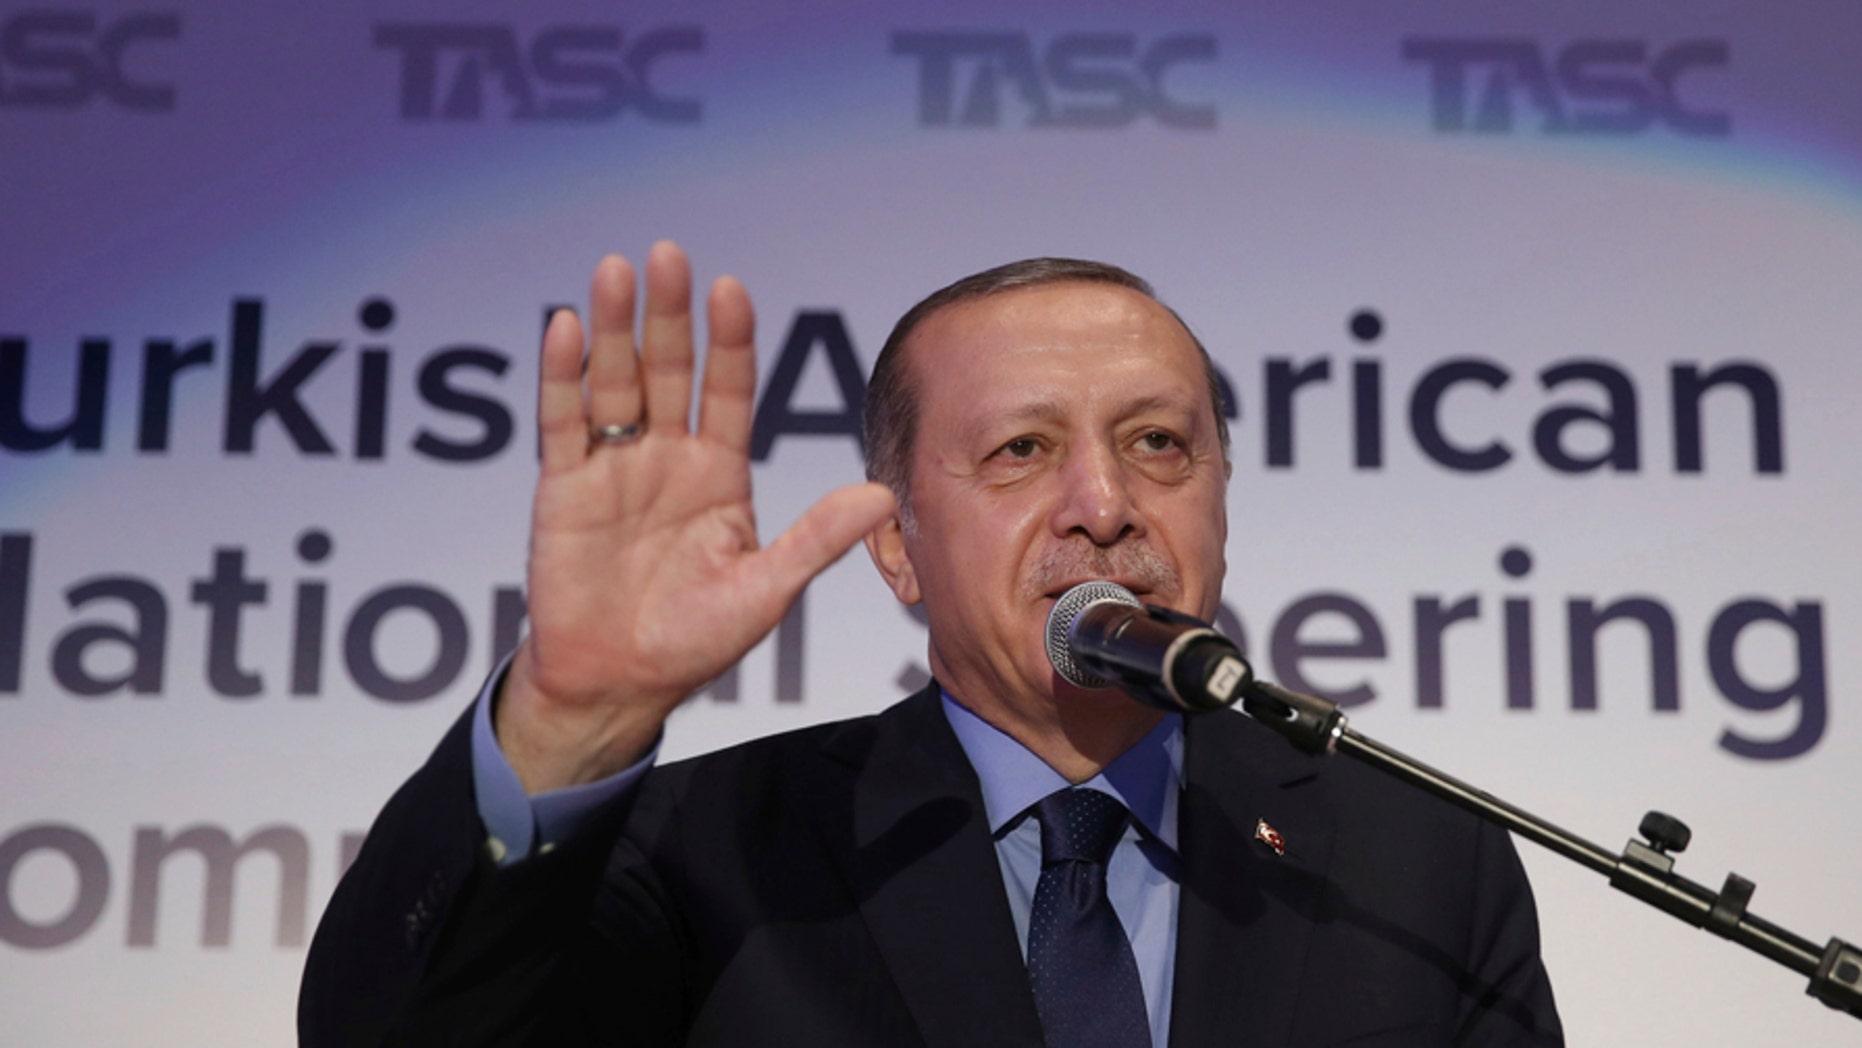 FILE -- Turkey's President Recep Tayyip Erdogan addresses a Turkish-American group meeting in New York, Thursday, Sept. 21, 2017.